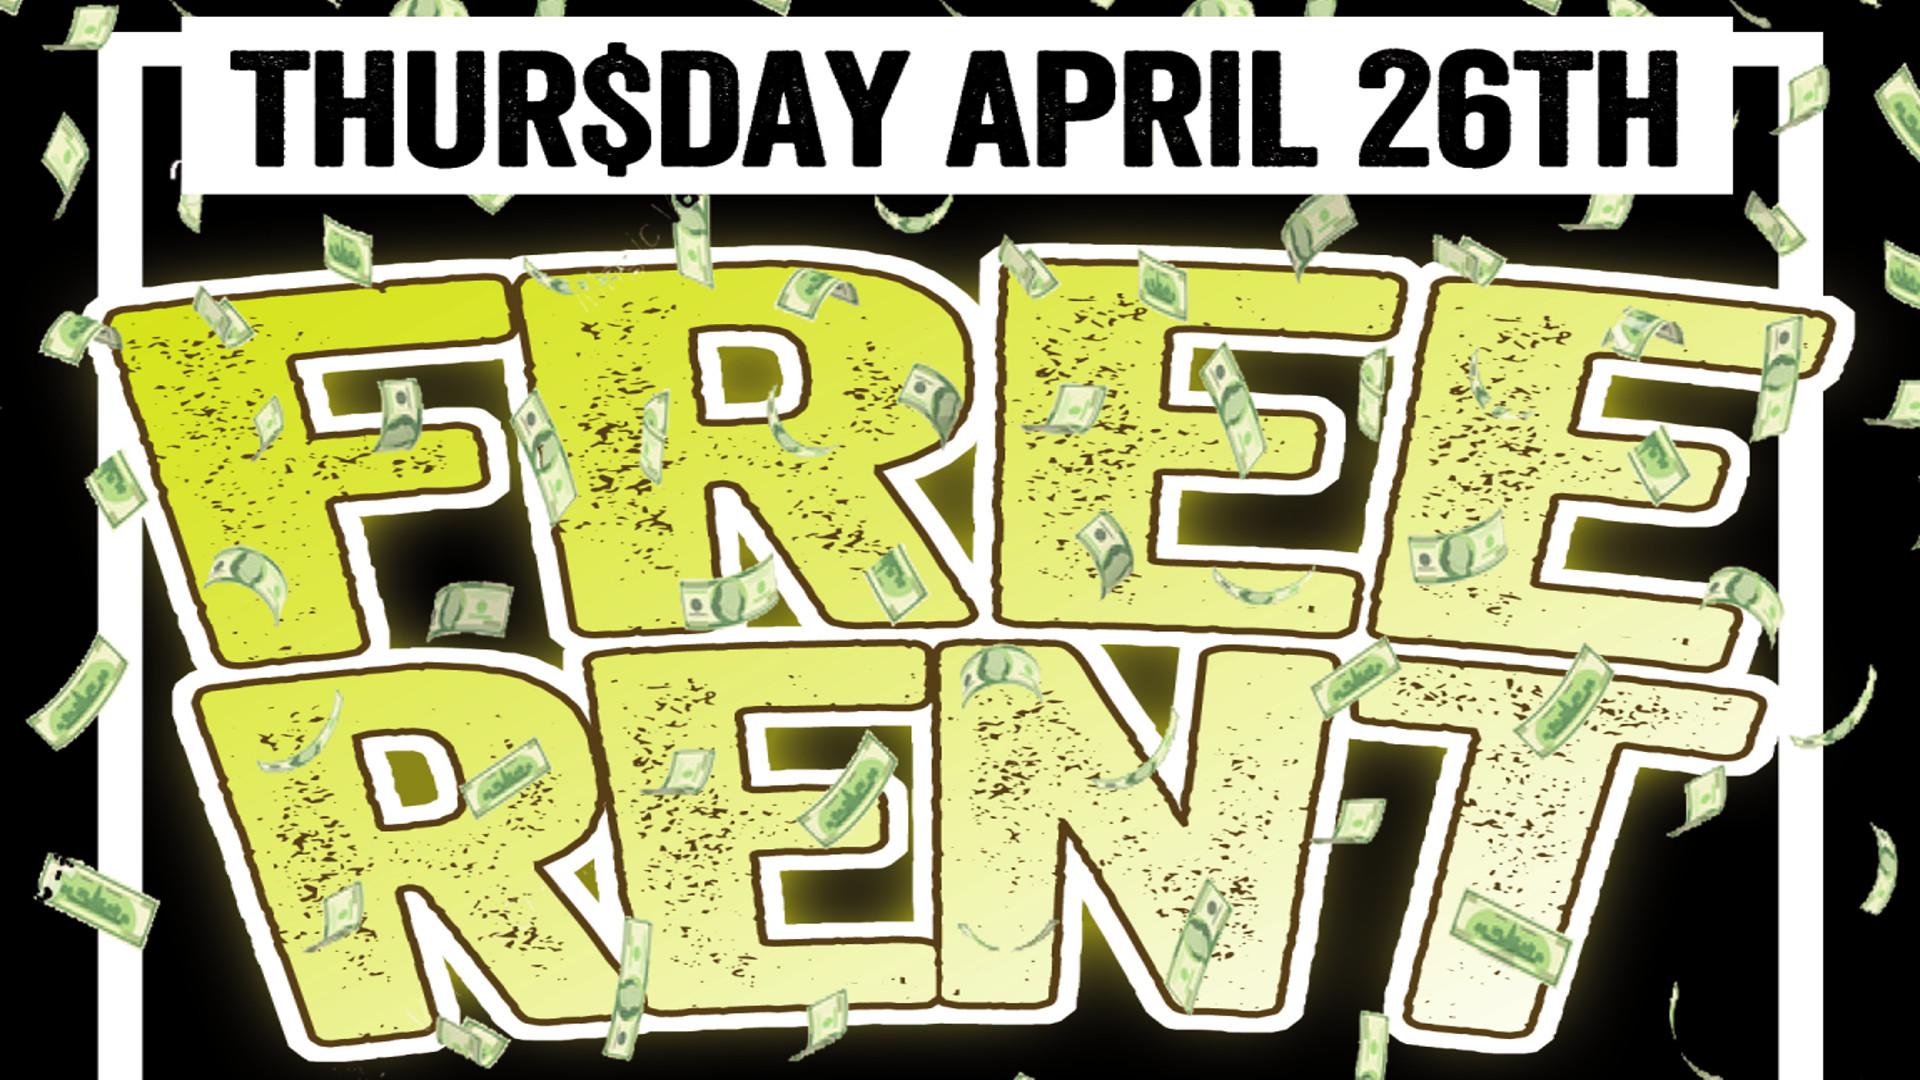 hoodoo free rent april 26 event.jpeg